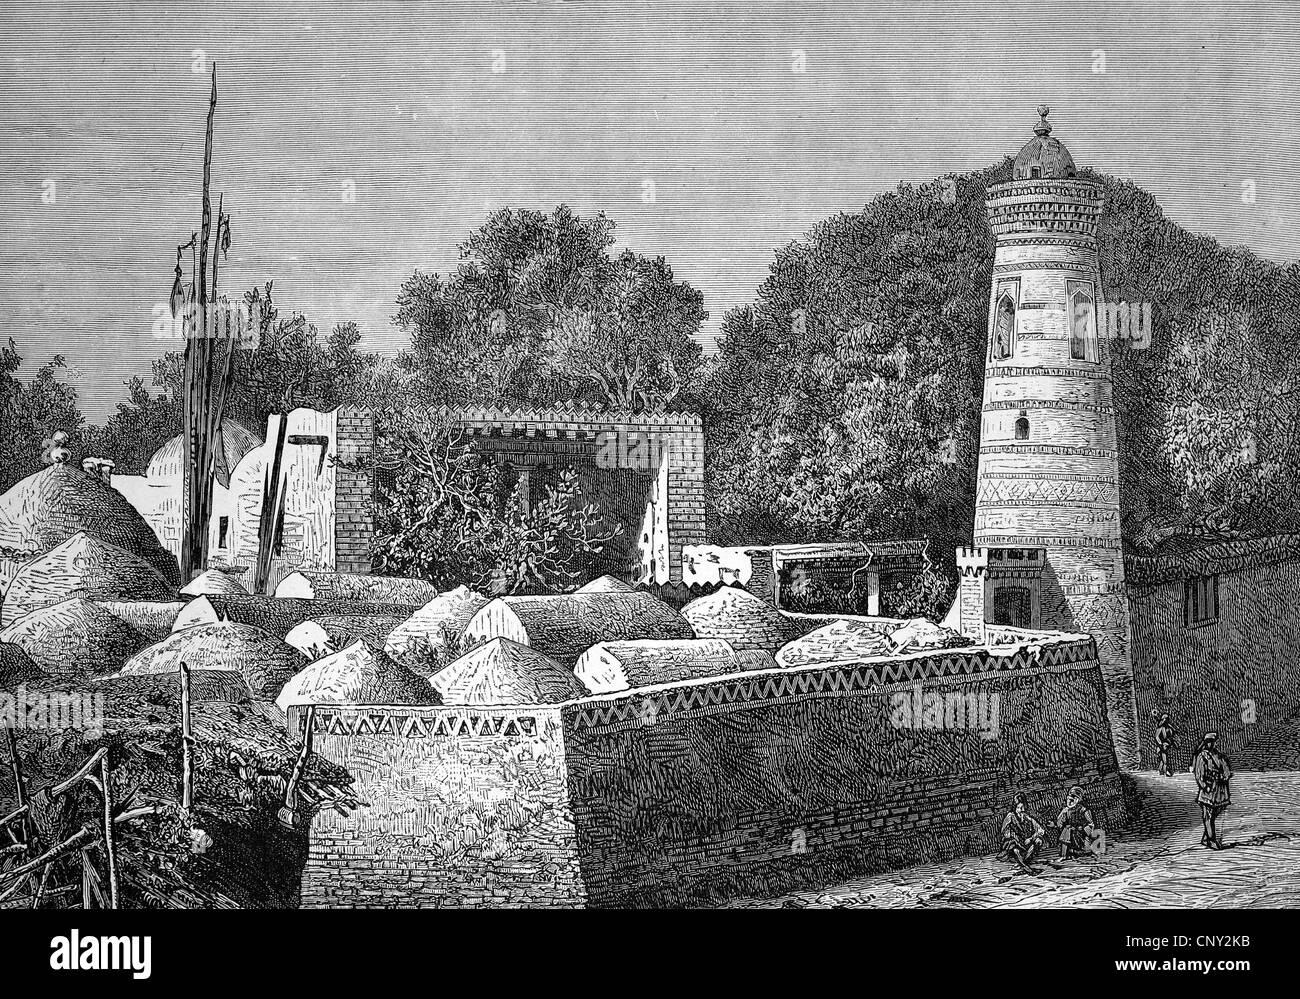 Islamic cemetery in Khiva, Xiva, an oasis town in northwestern Uzbekistan, historical illustration, wood engraving, - Stock Image